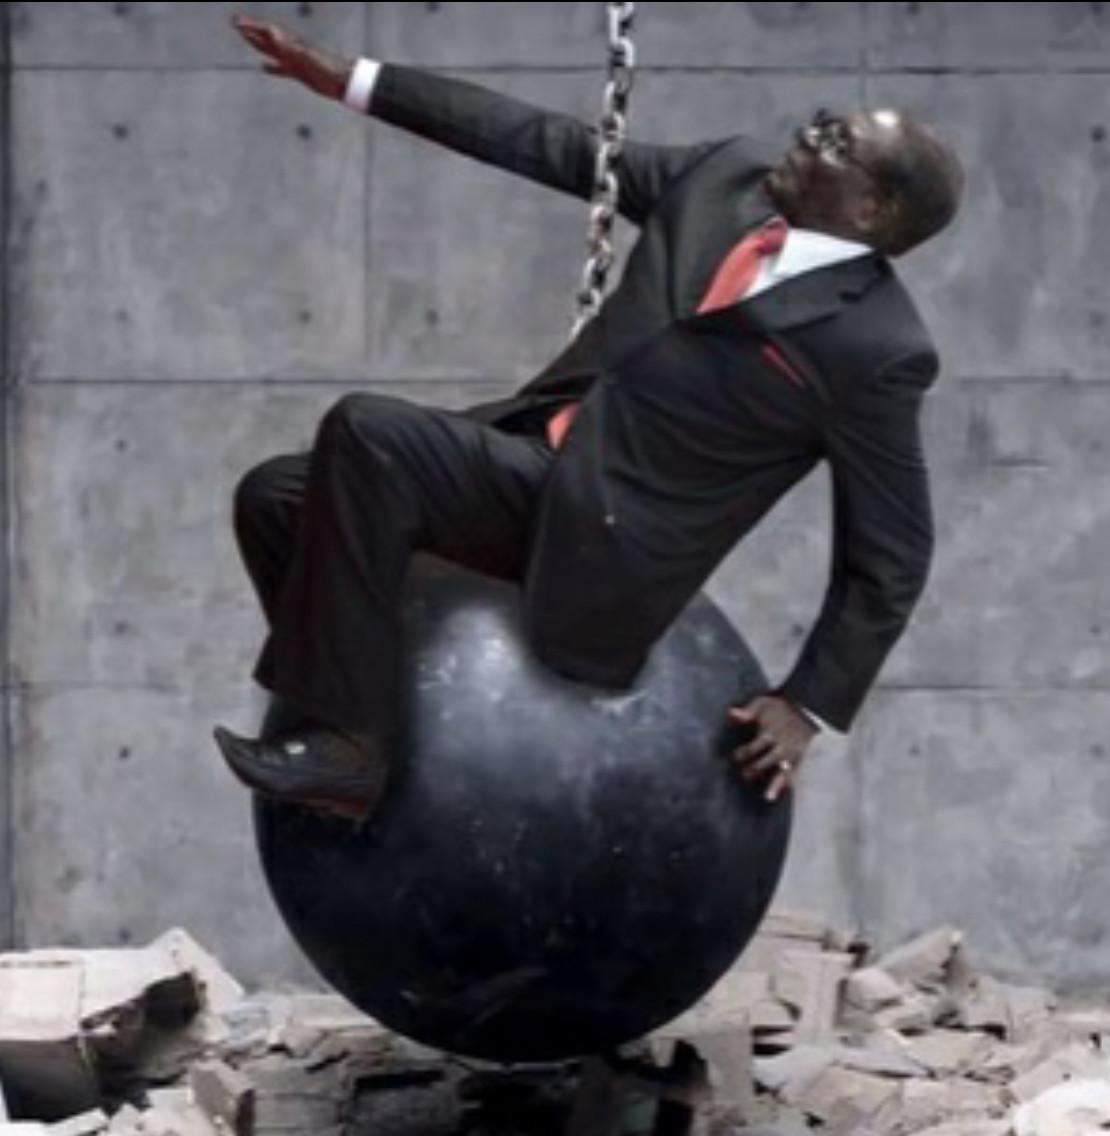 I fell down like a wrecking ball! - meme